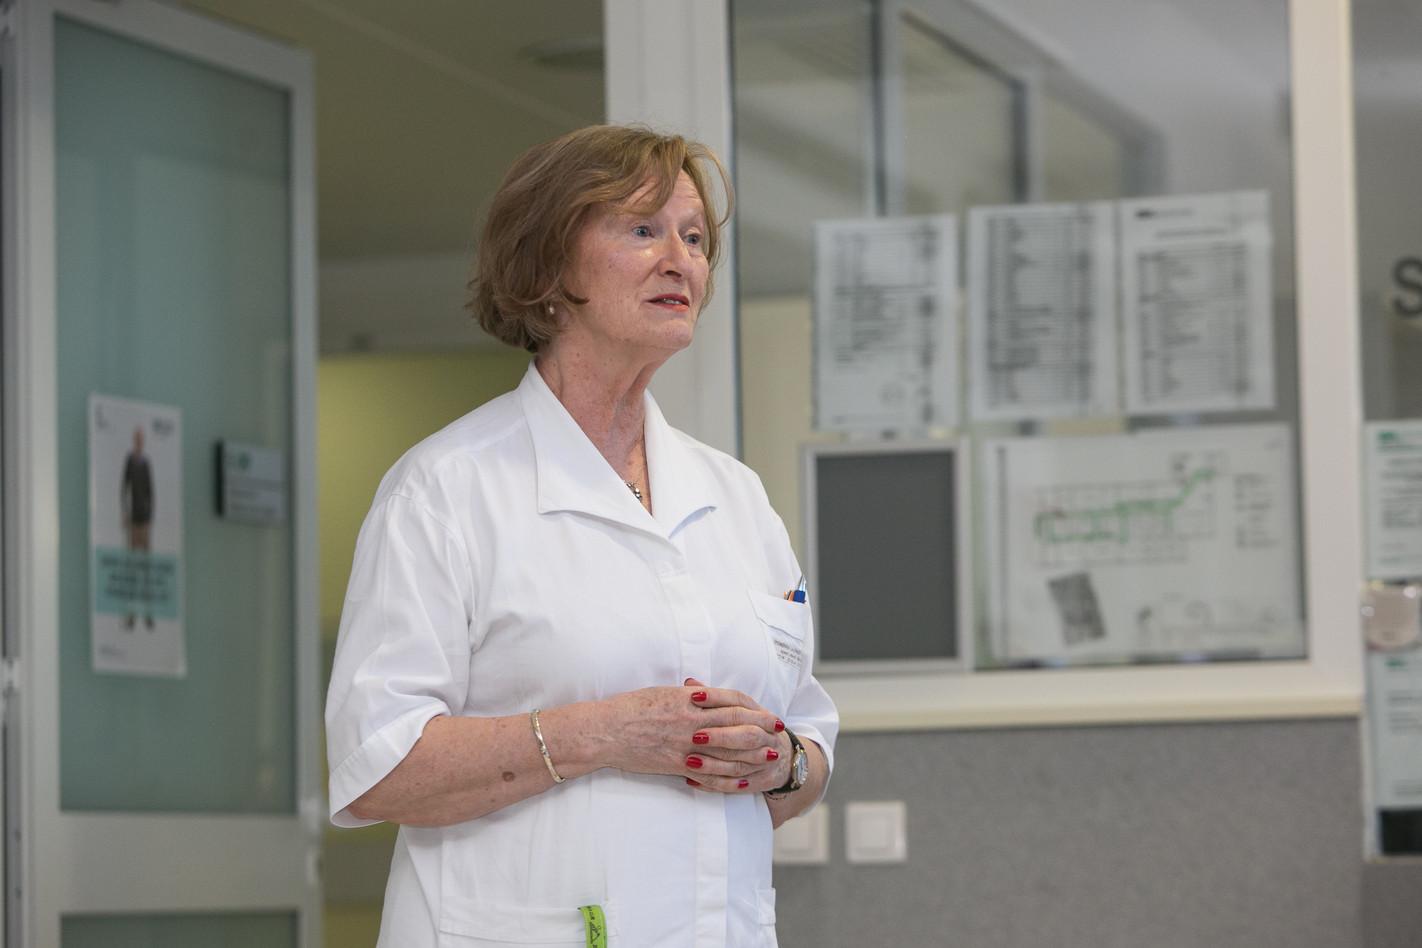 Spomenka Lajtner, explaining laboratory diagnostics at Community Health Centre Ljubljana